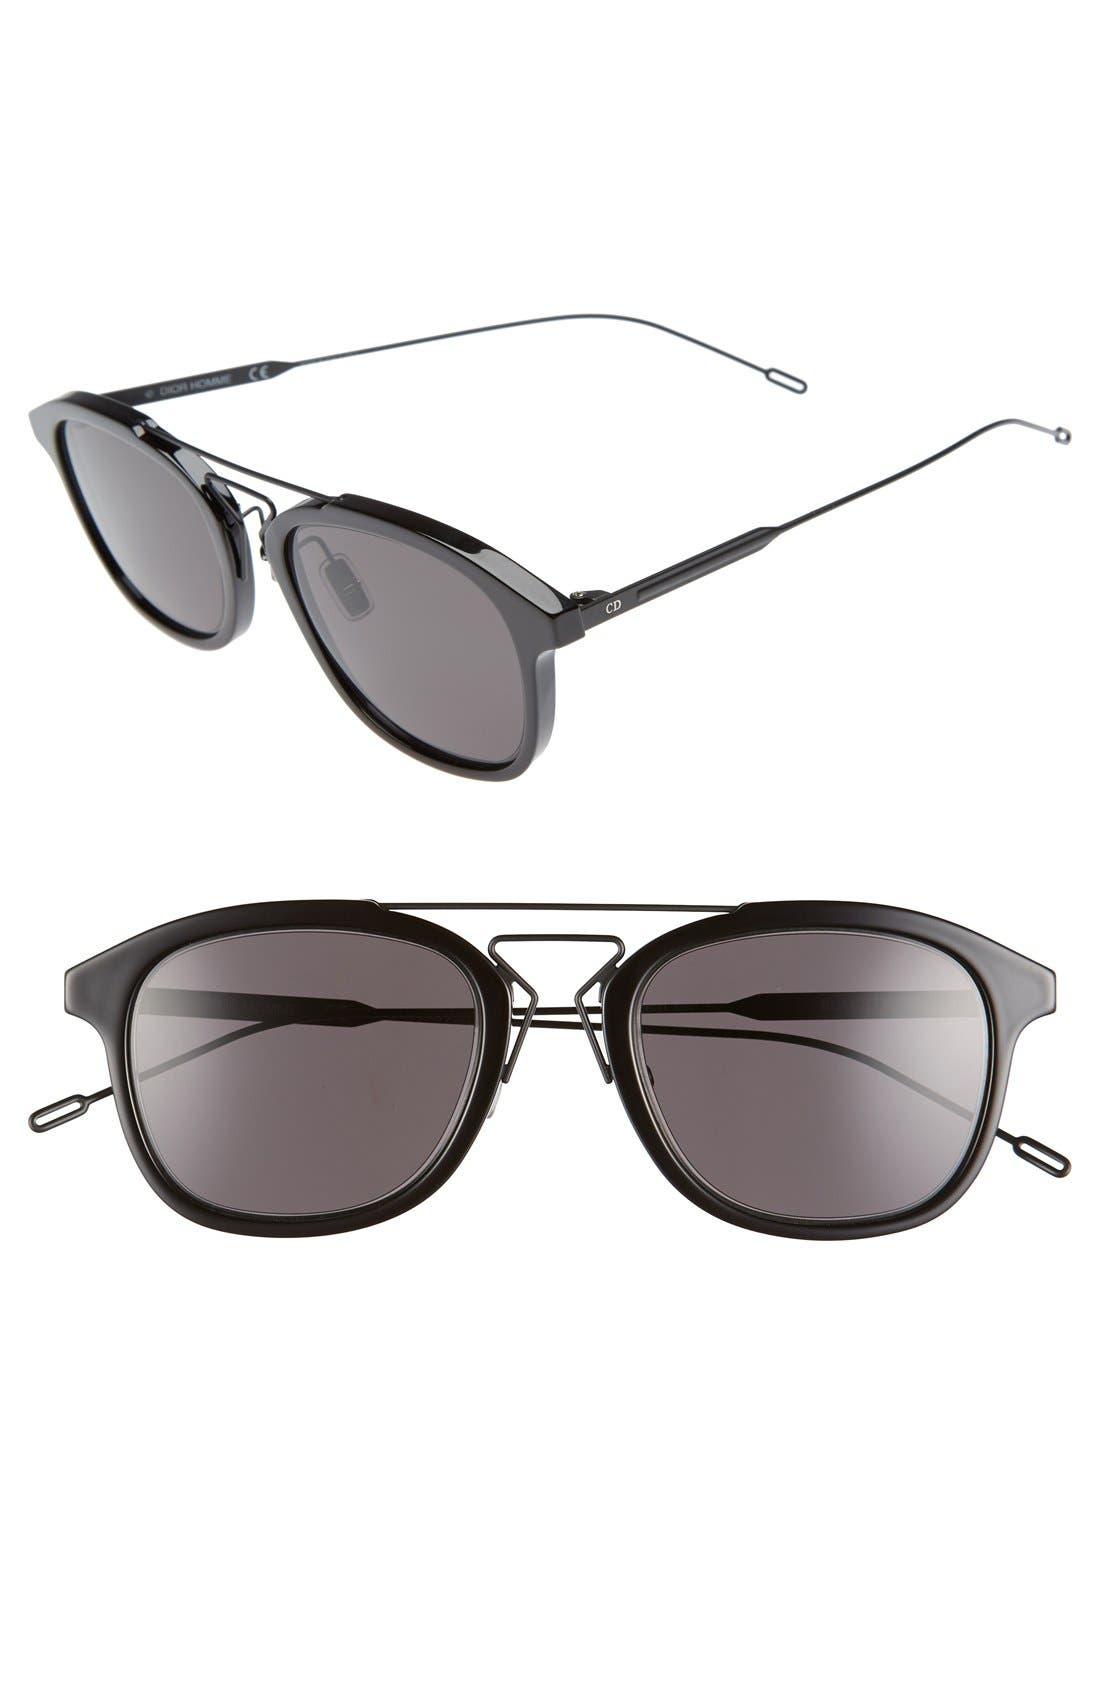 Main Image - Dior Homme 52mm 'Black Tie' Sunglasses